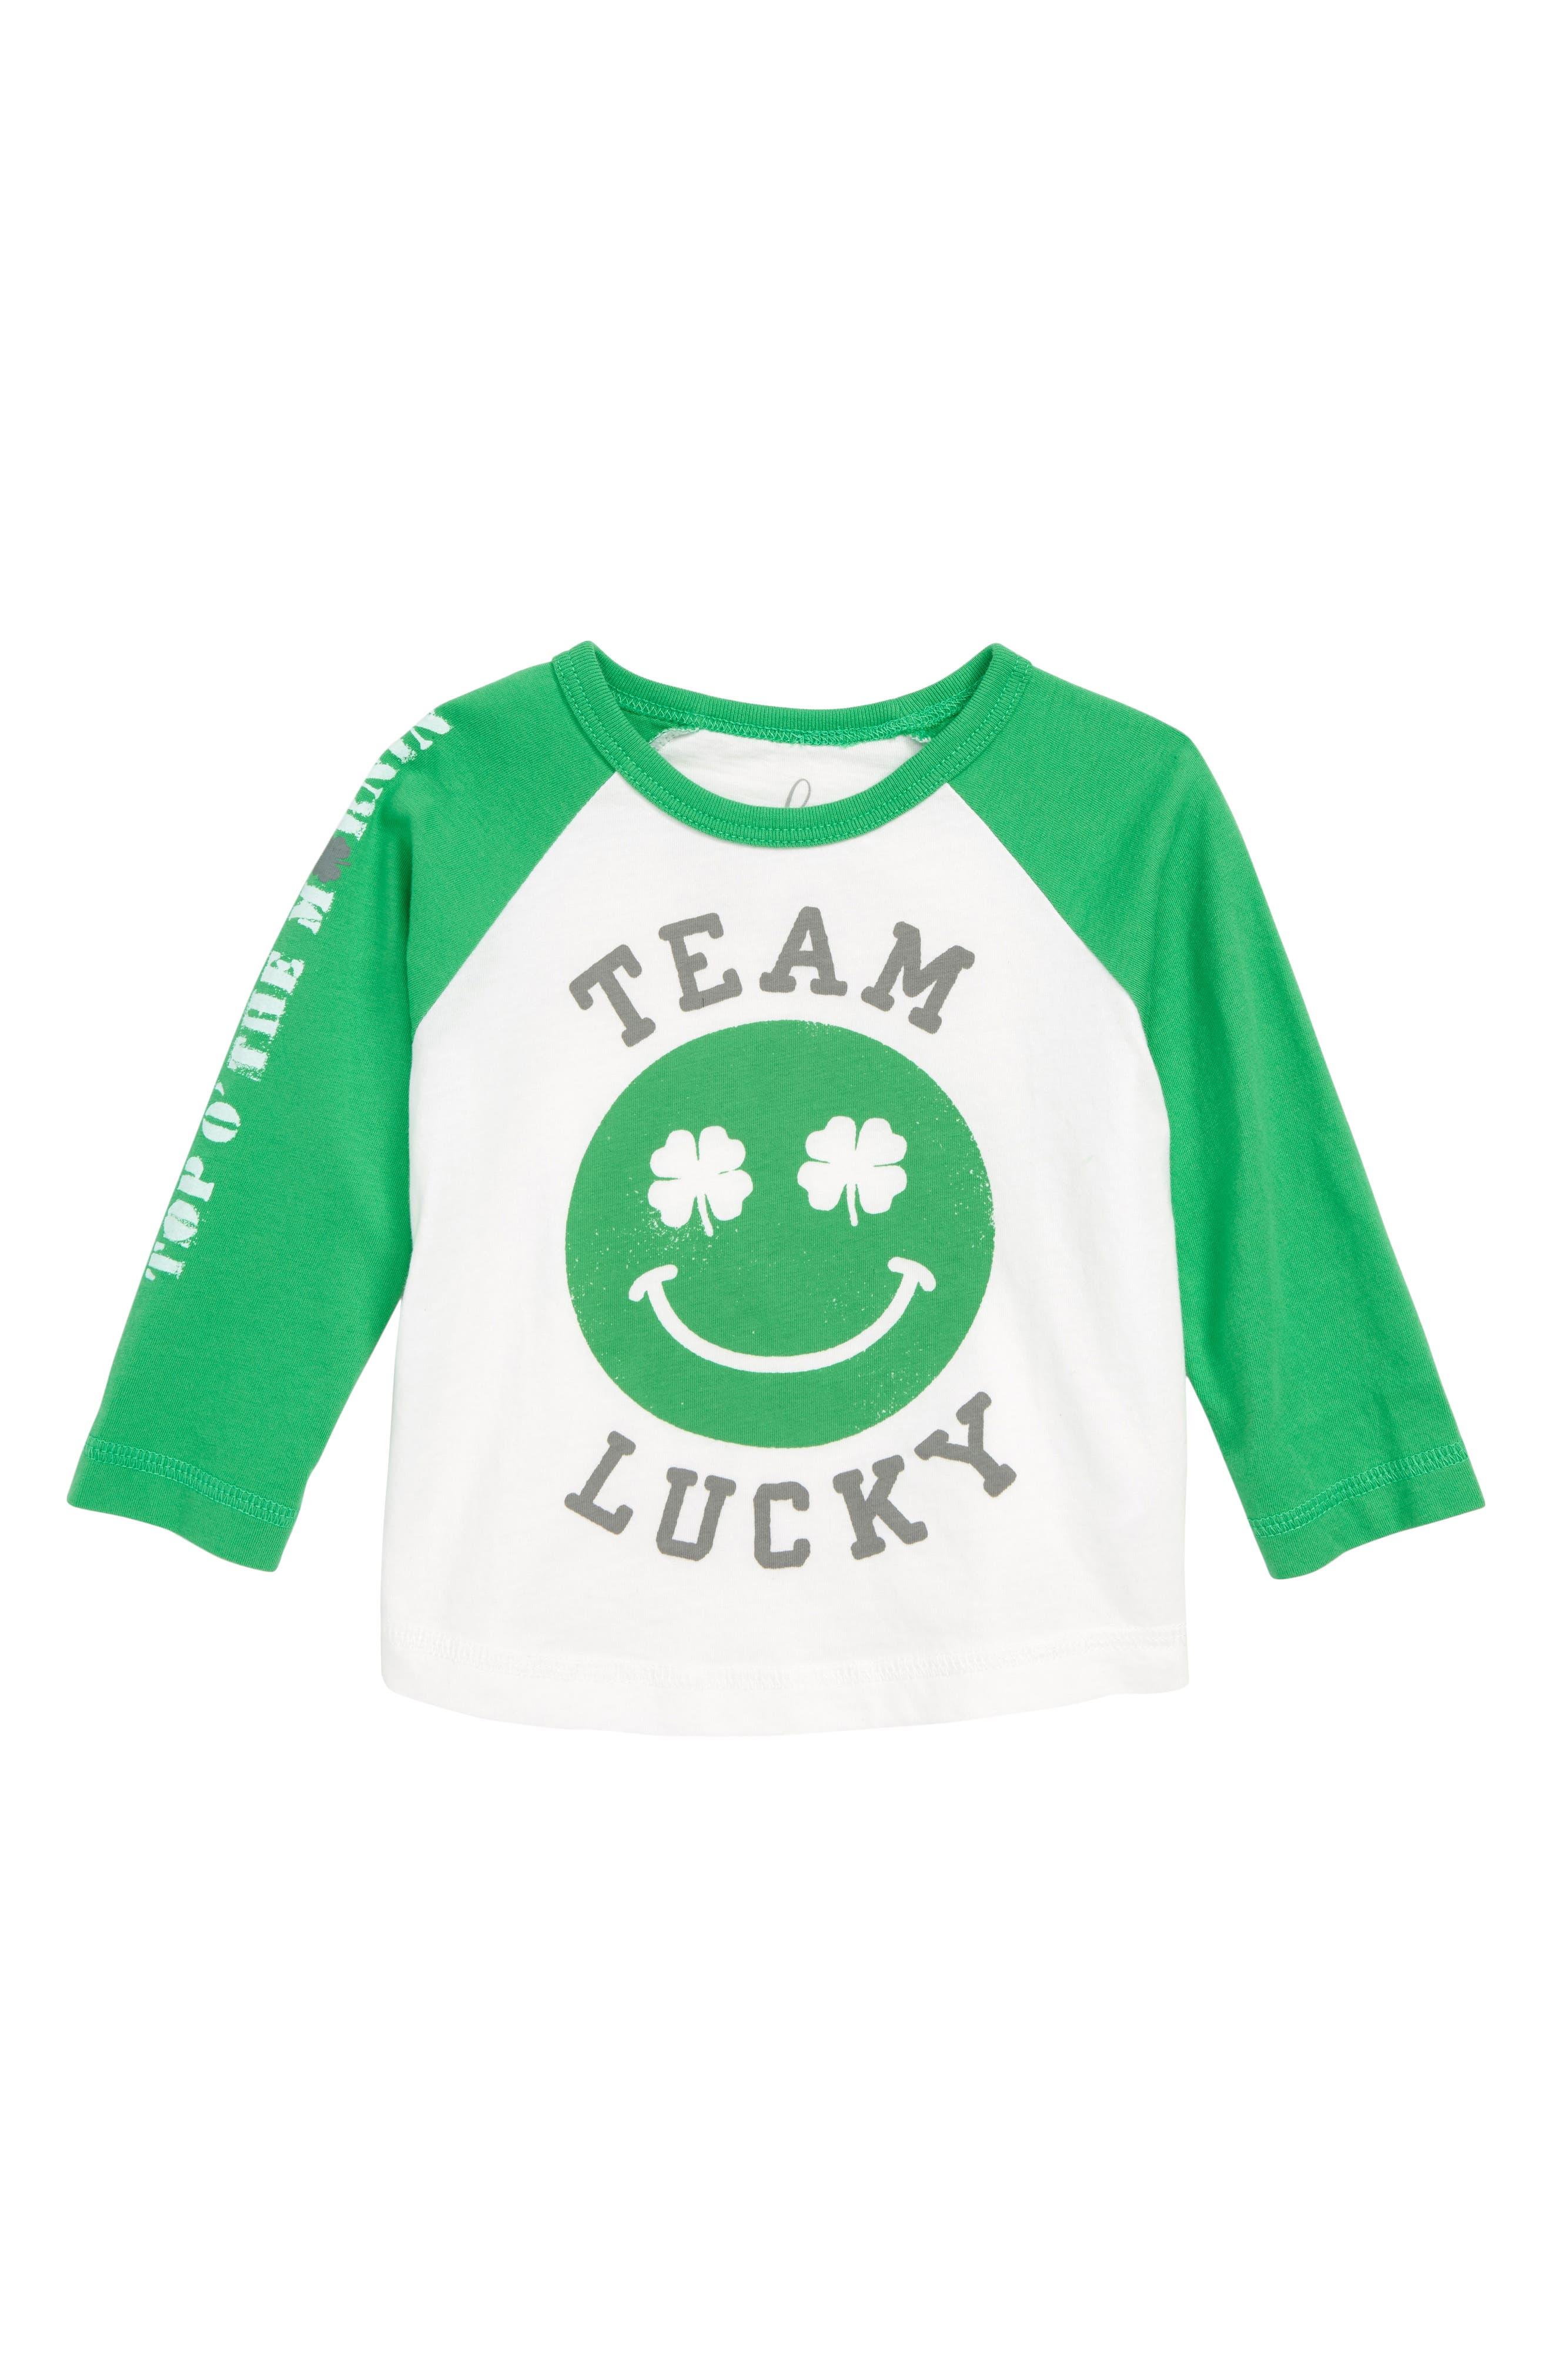 Peek Team Lucky Graphic T-Shirt, Main, color, 300